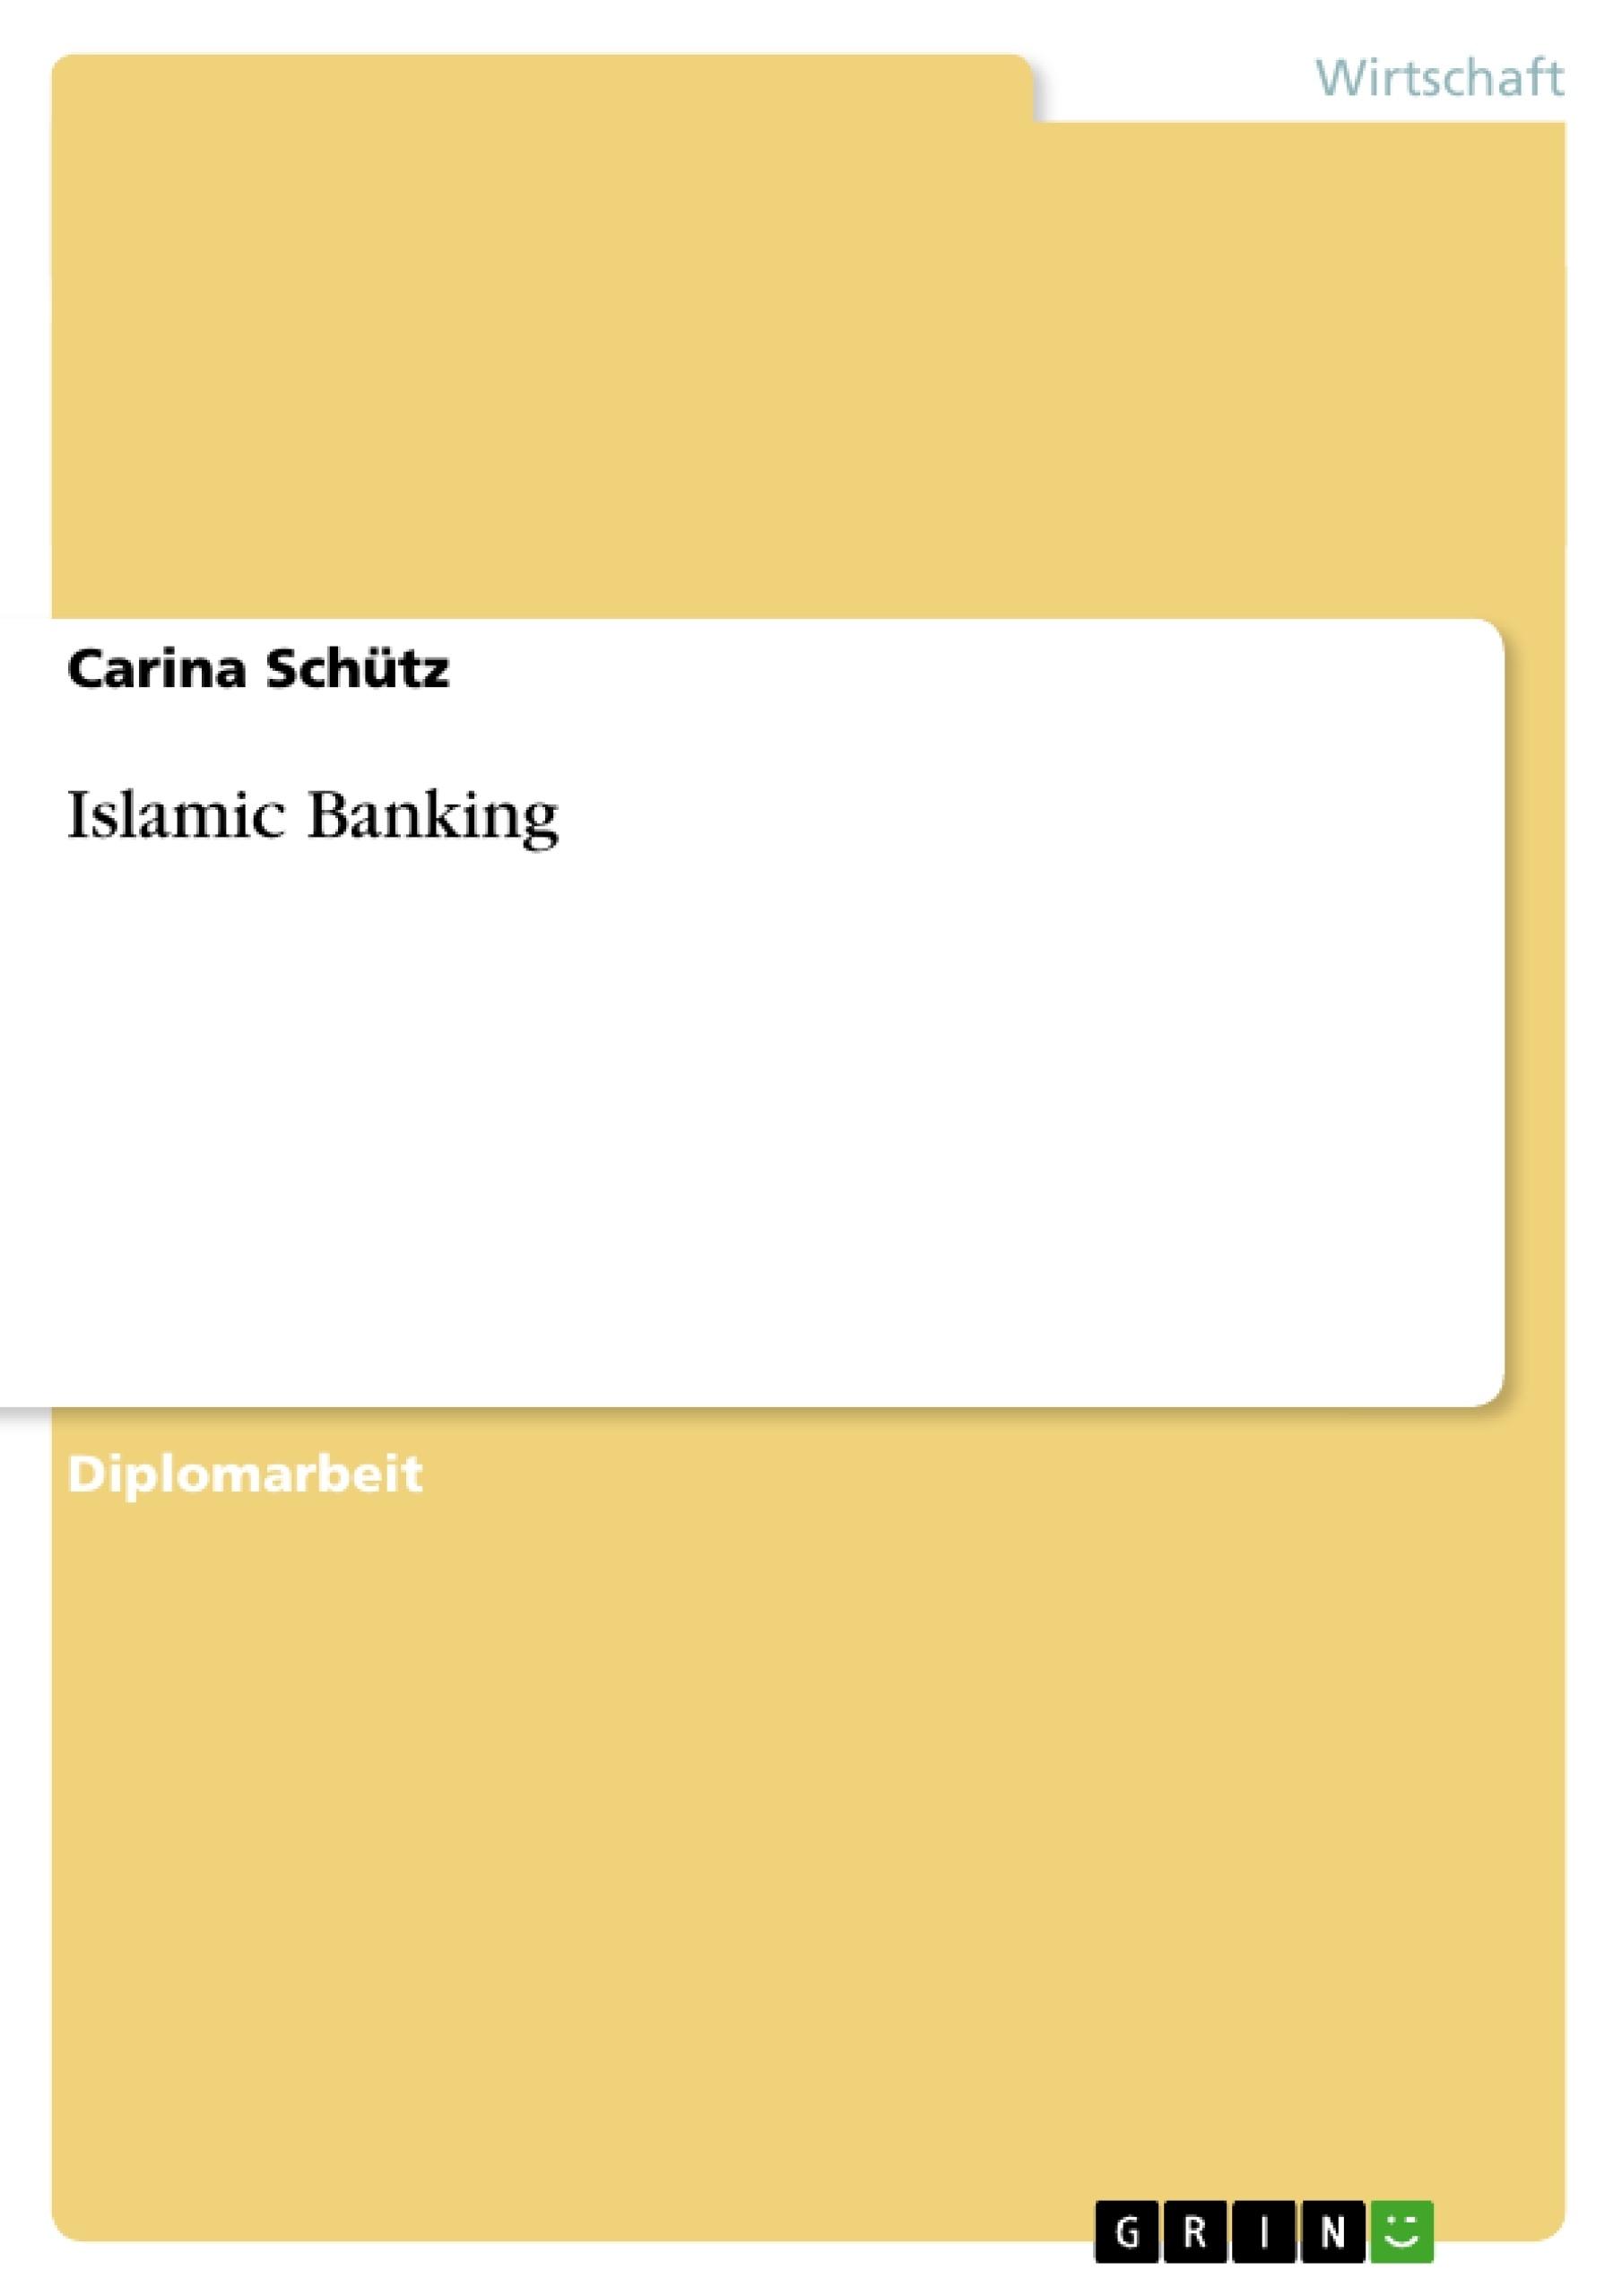 Titel: Islamic Banking